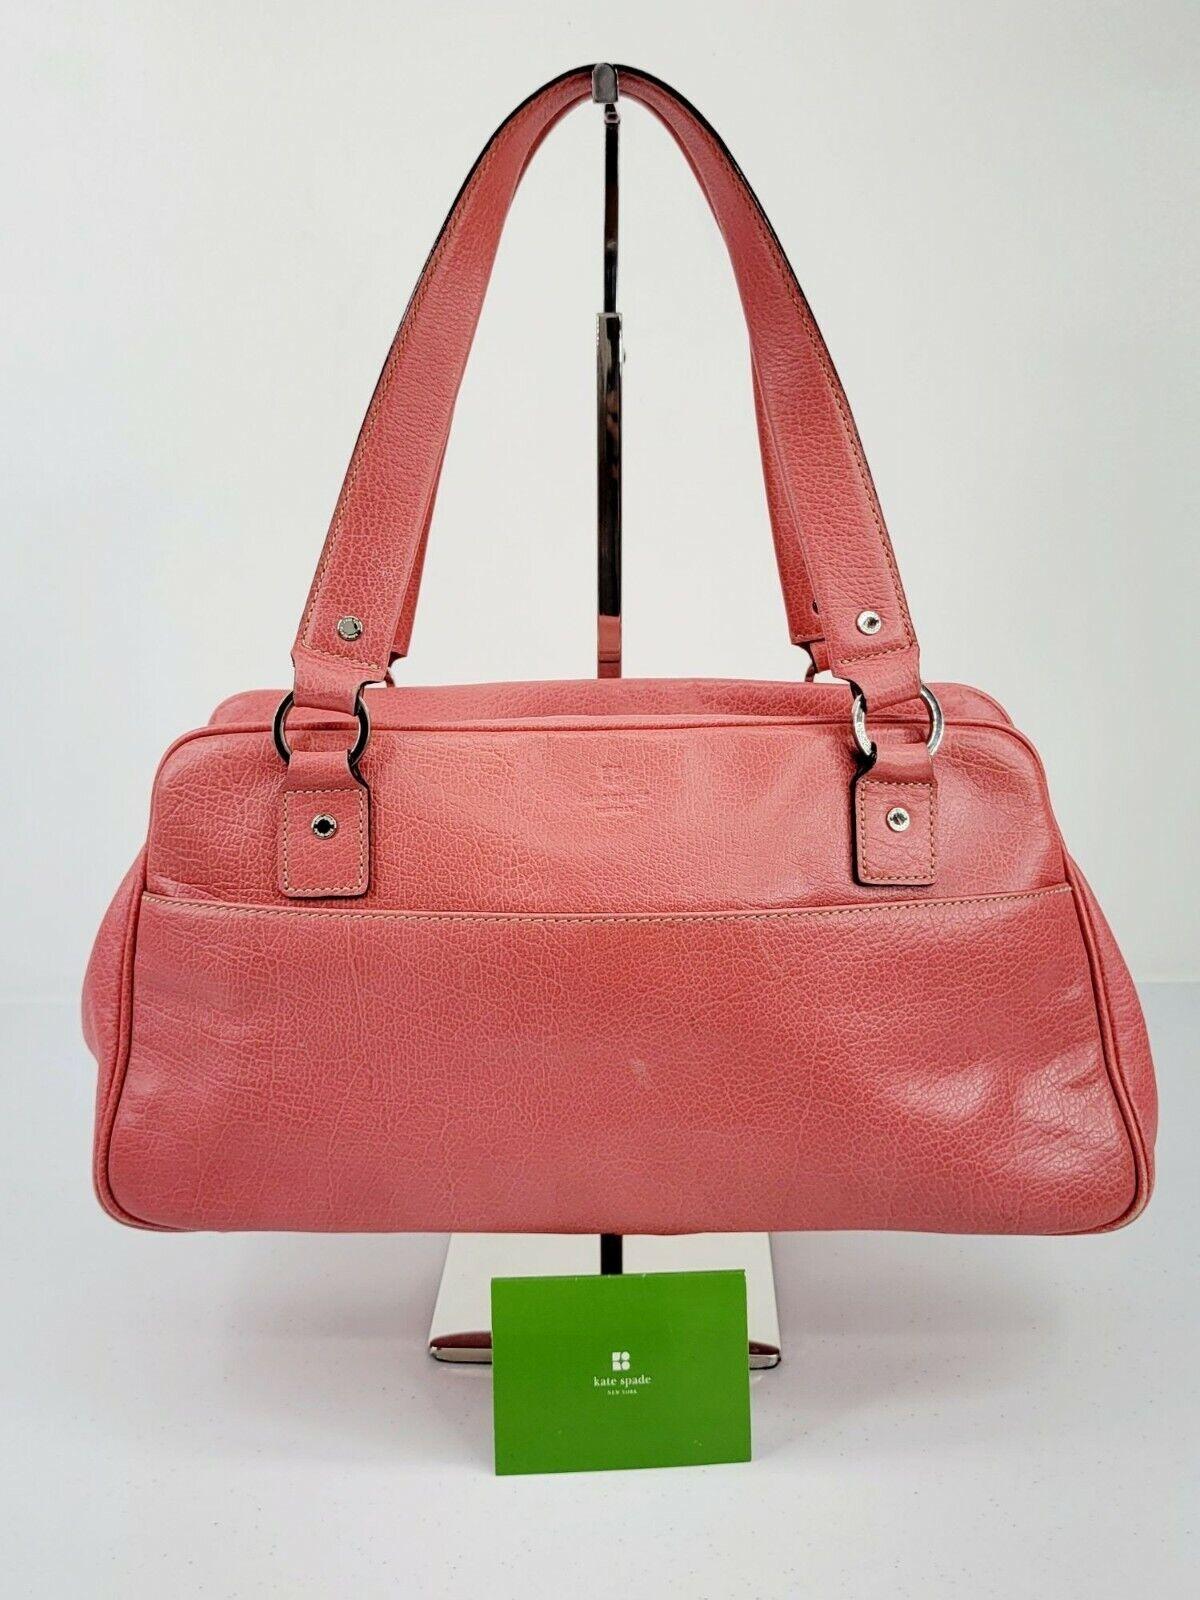 Kate Spade New York Bubblegum Pink Leather Satche… - image 1